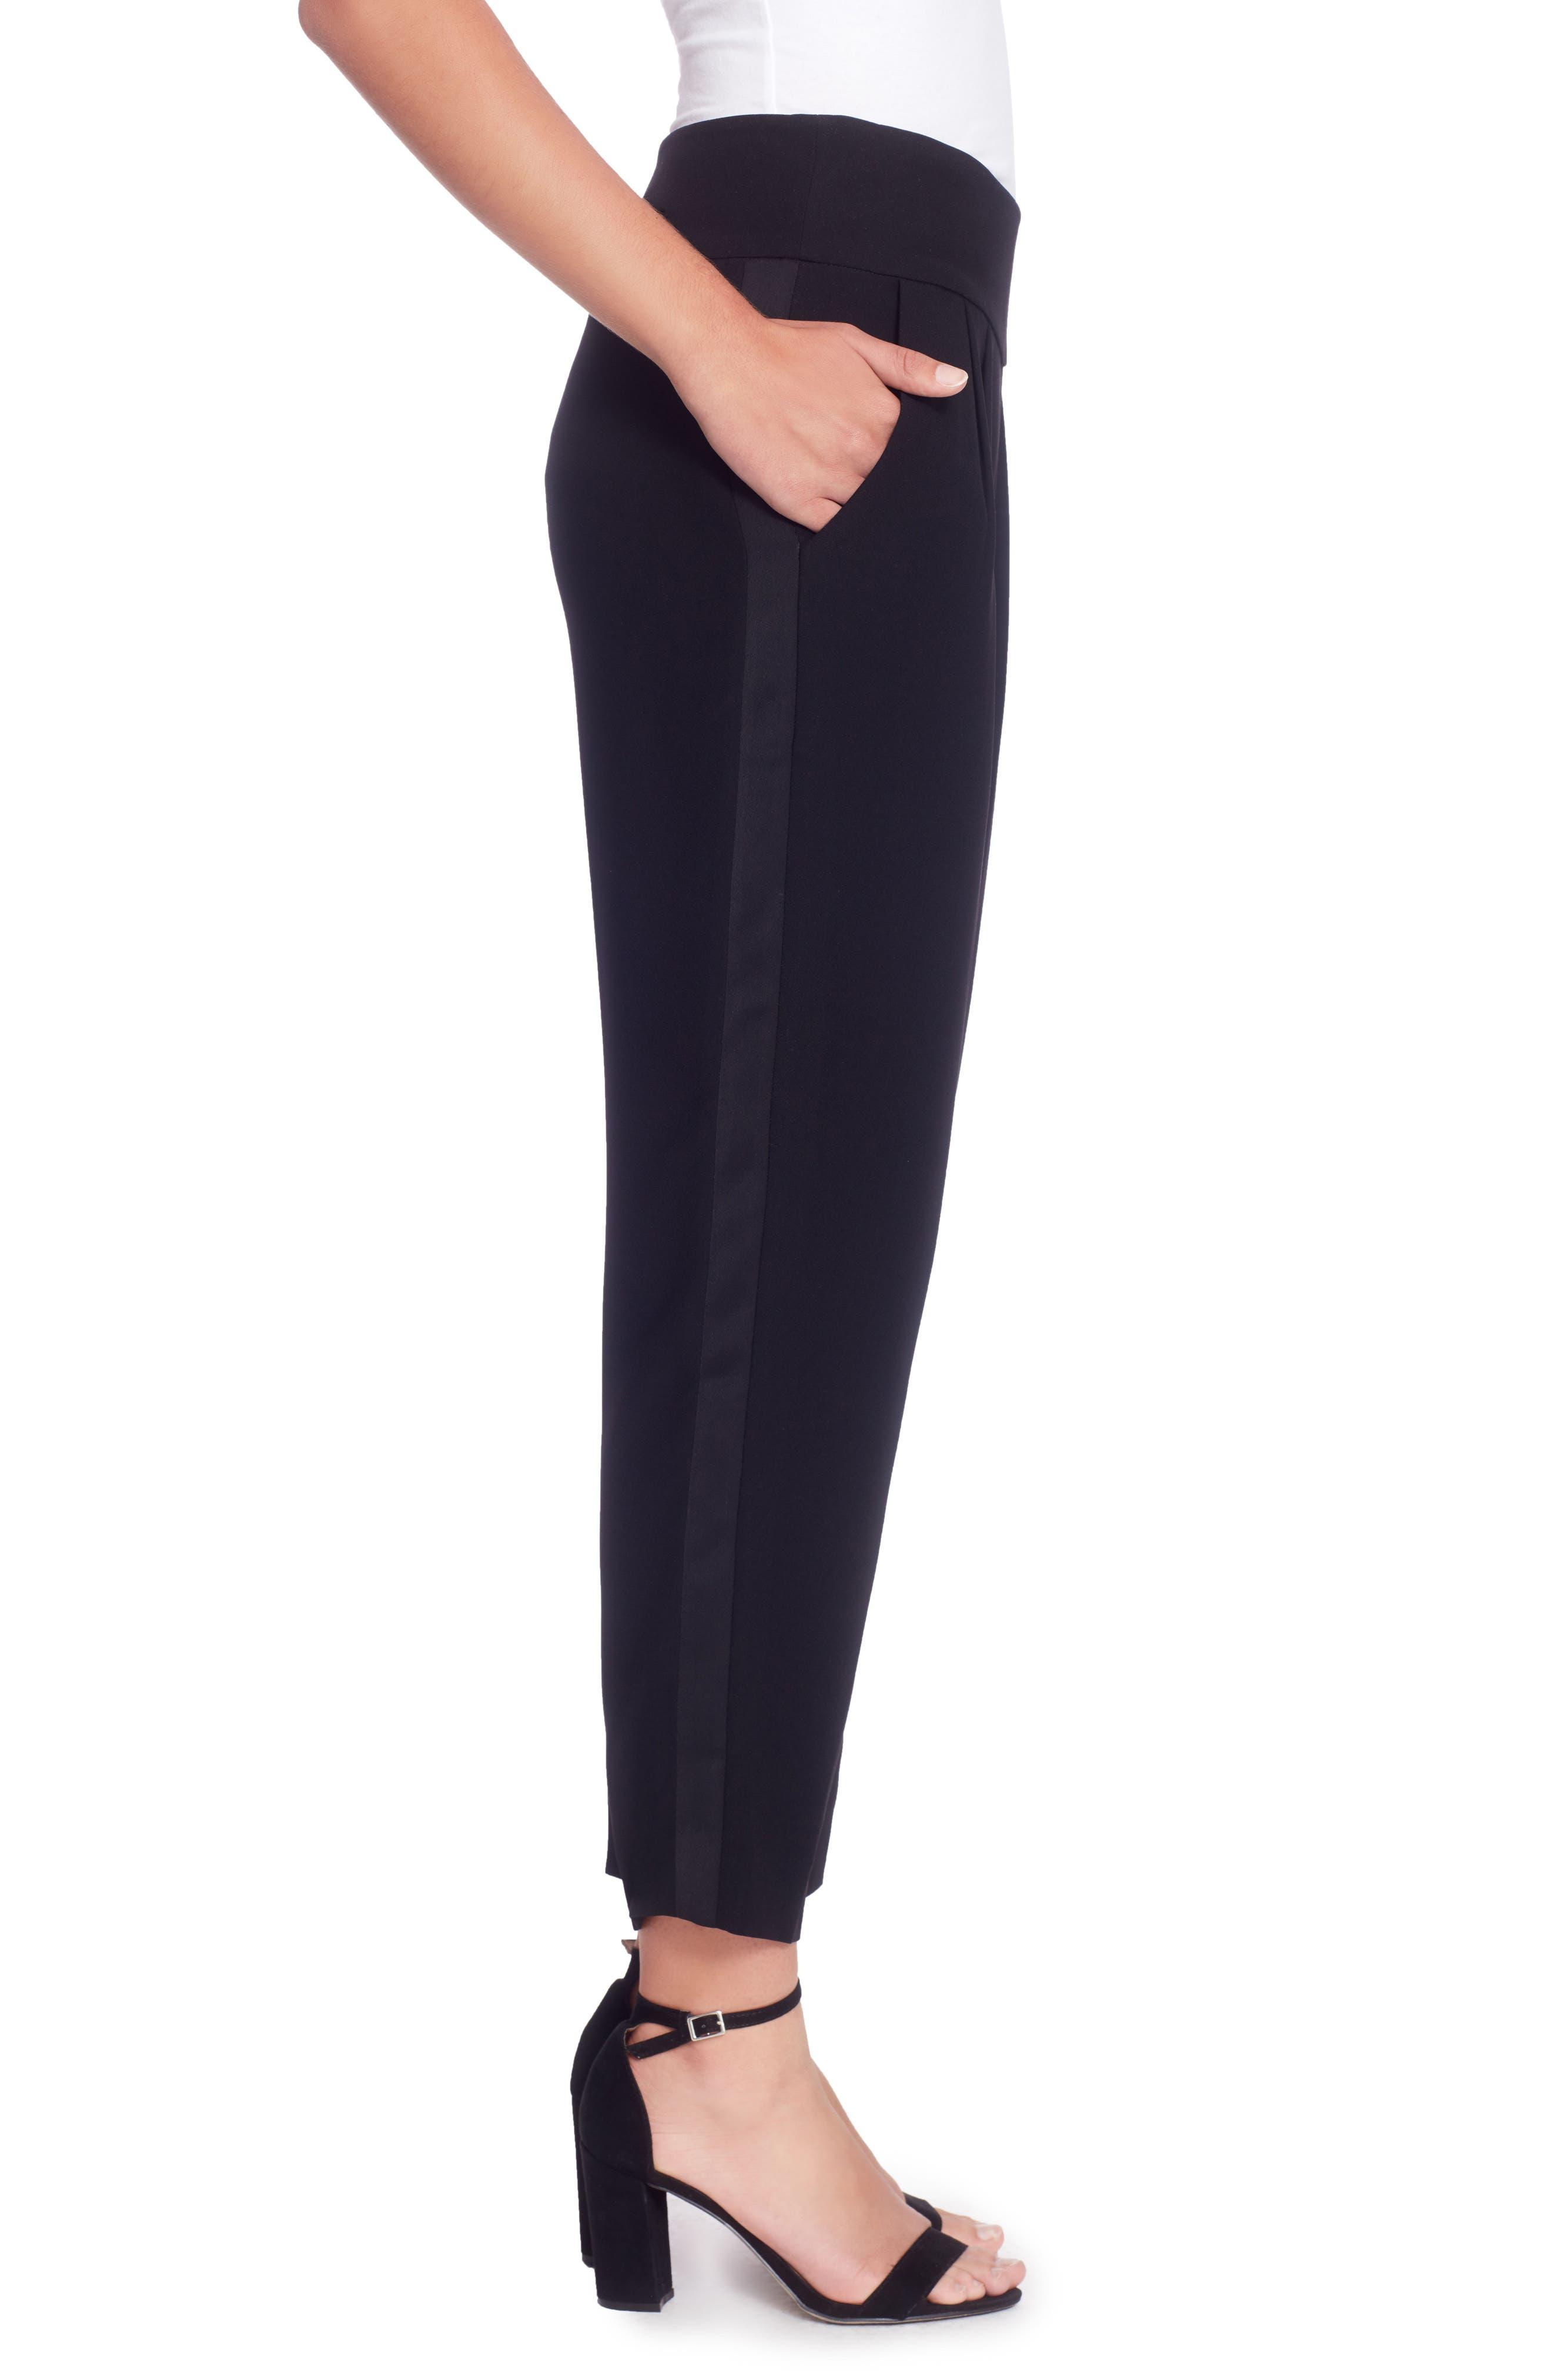 Luca Tuxedo Ankle Pants,                             Alternate thumbnail 3, color,                             Black